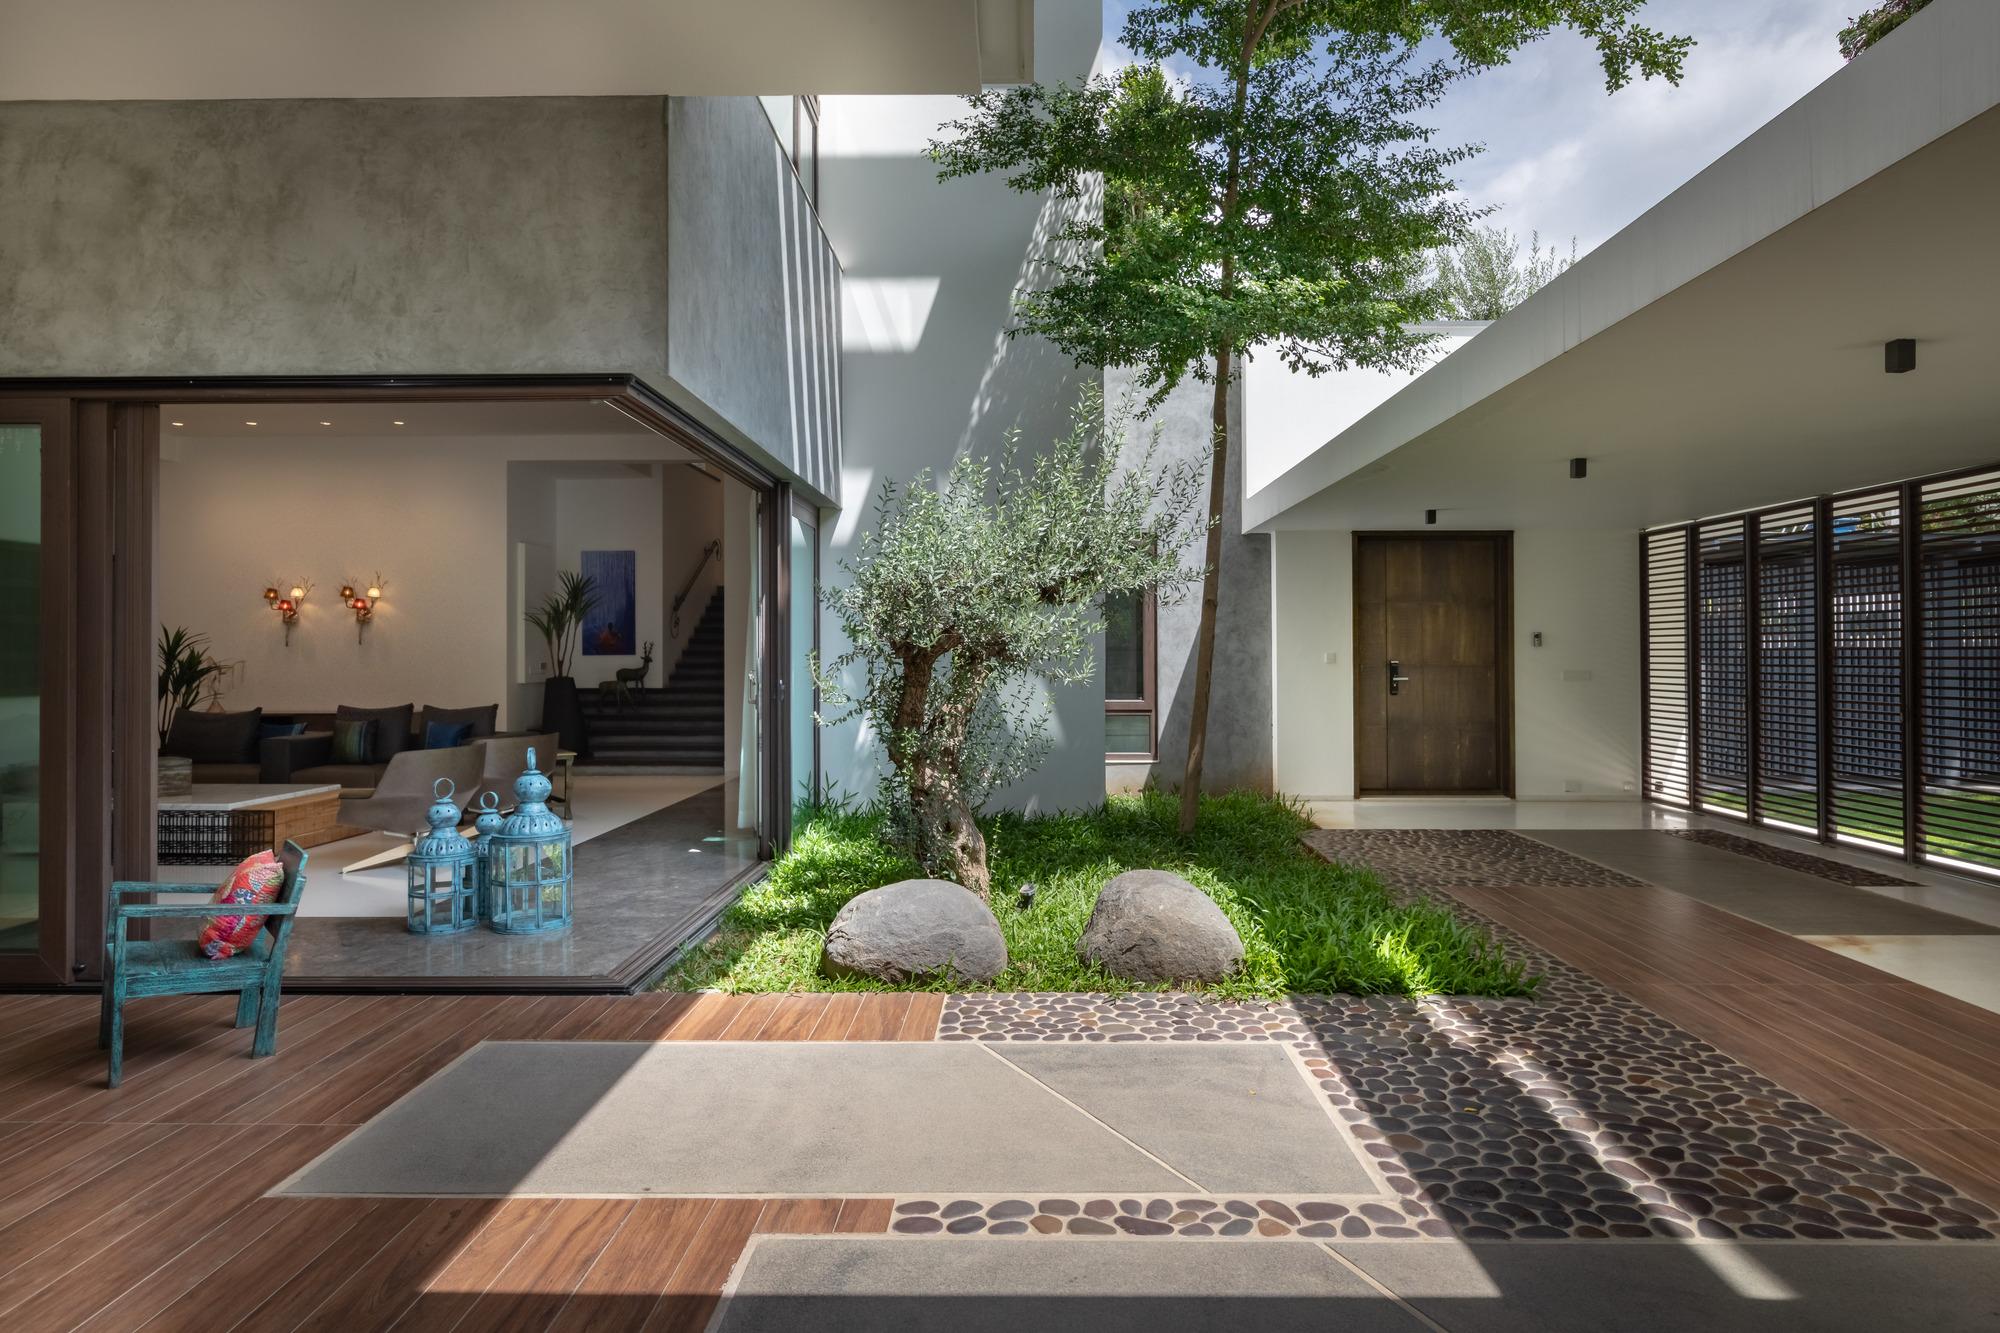 courtyard villa moriq archdaily